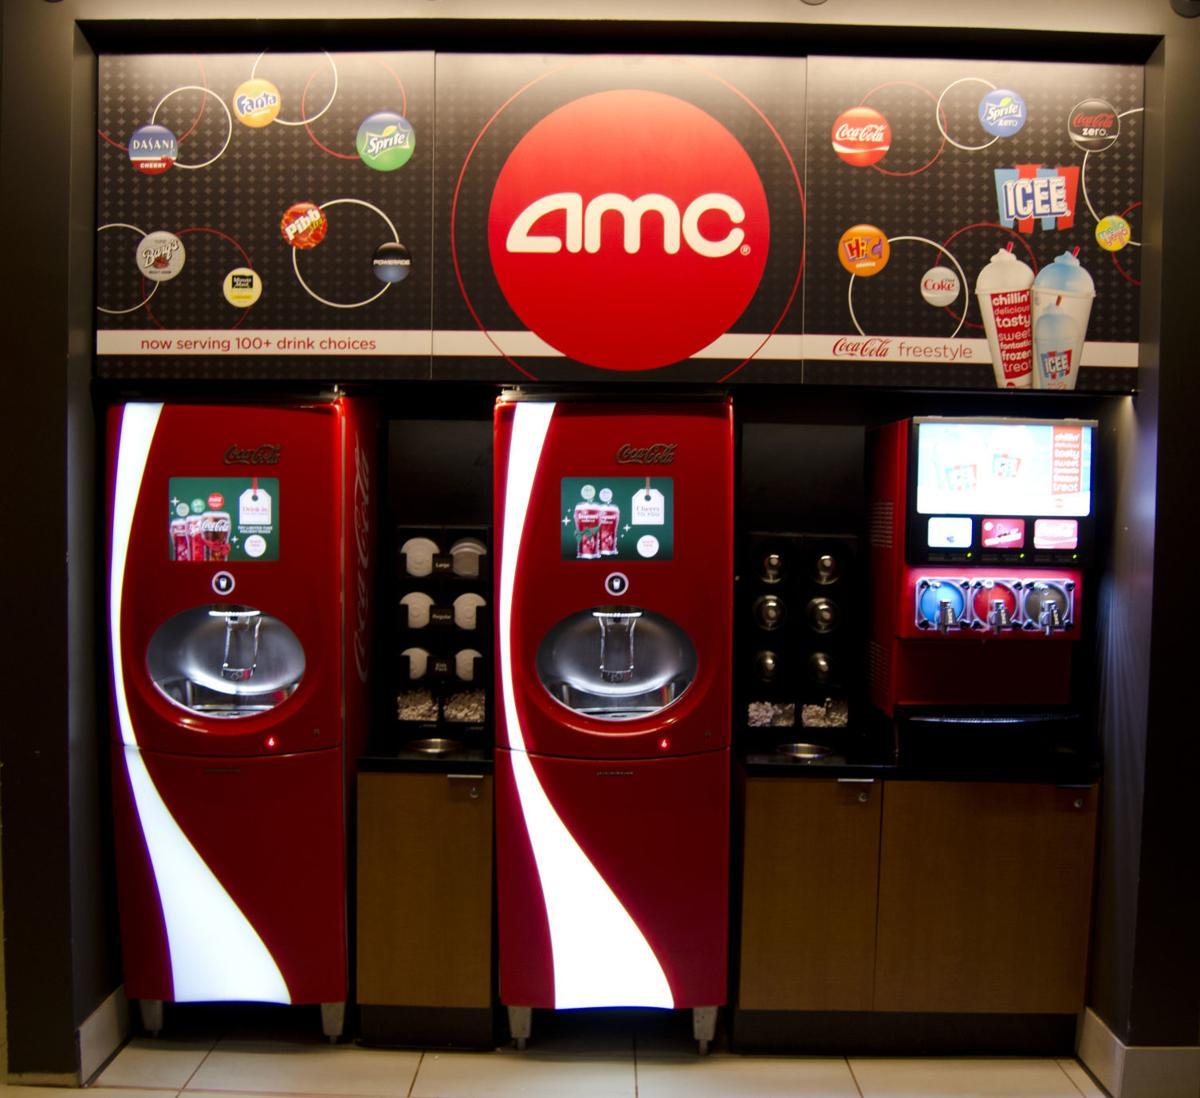 AMC Coke and ICEE machines